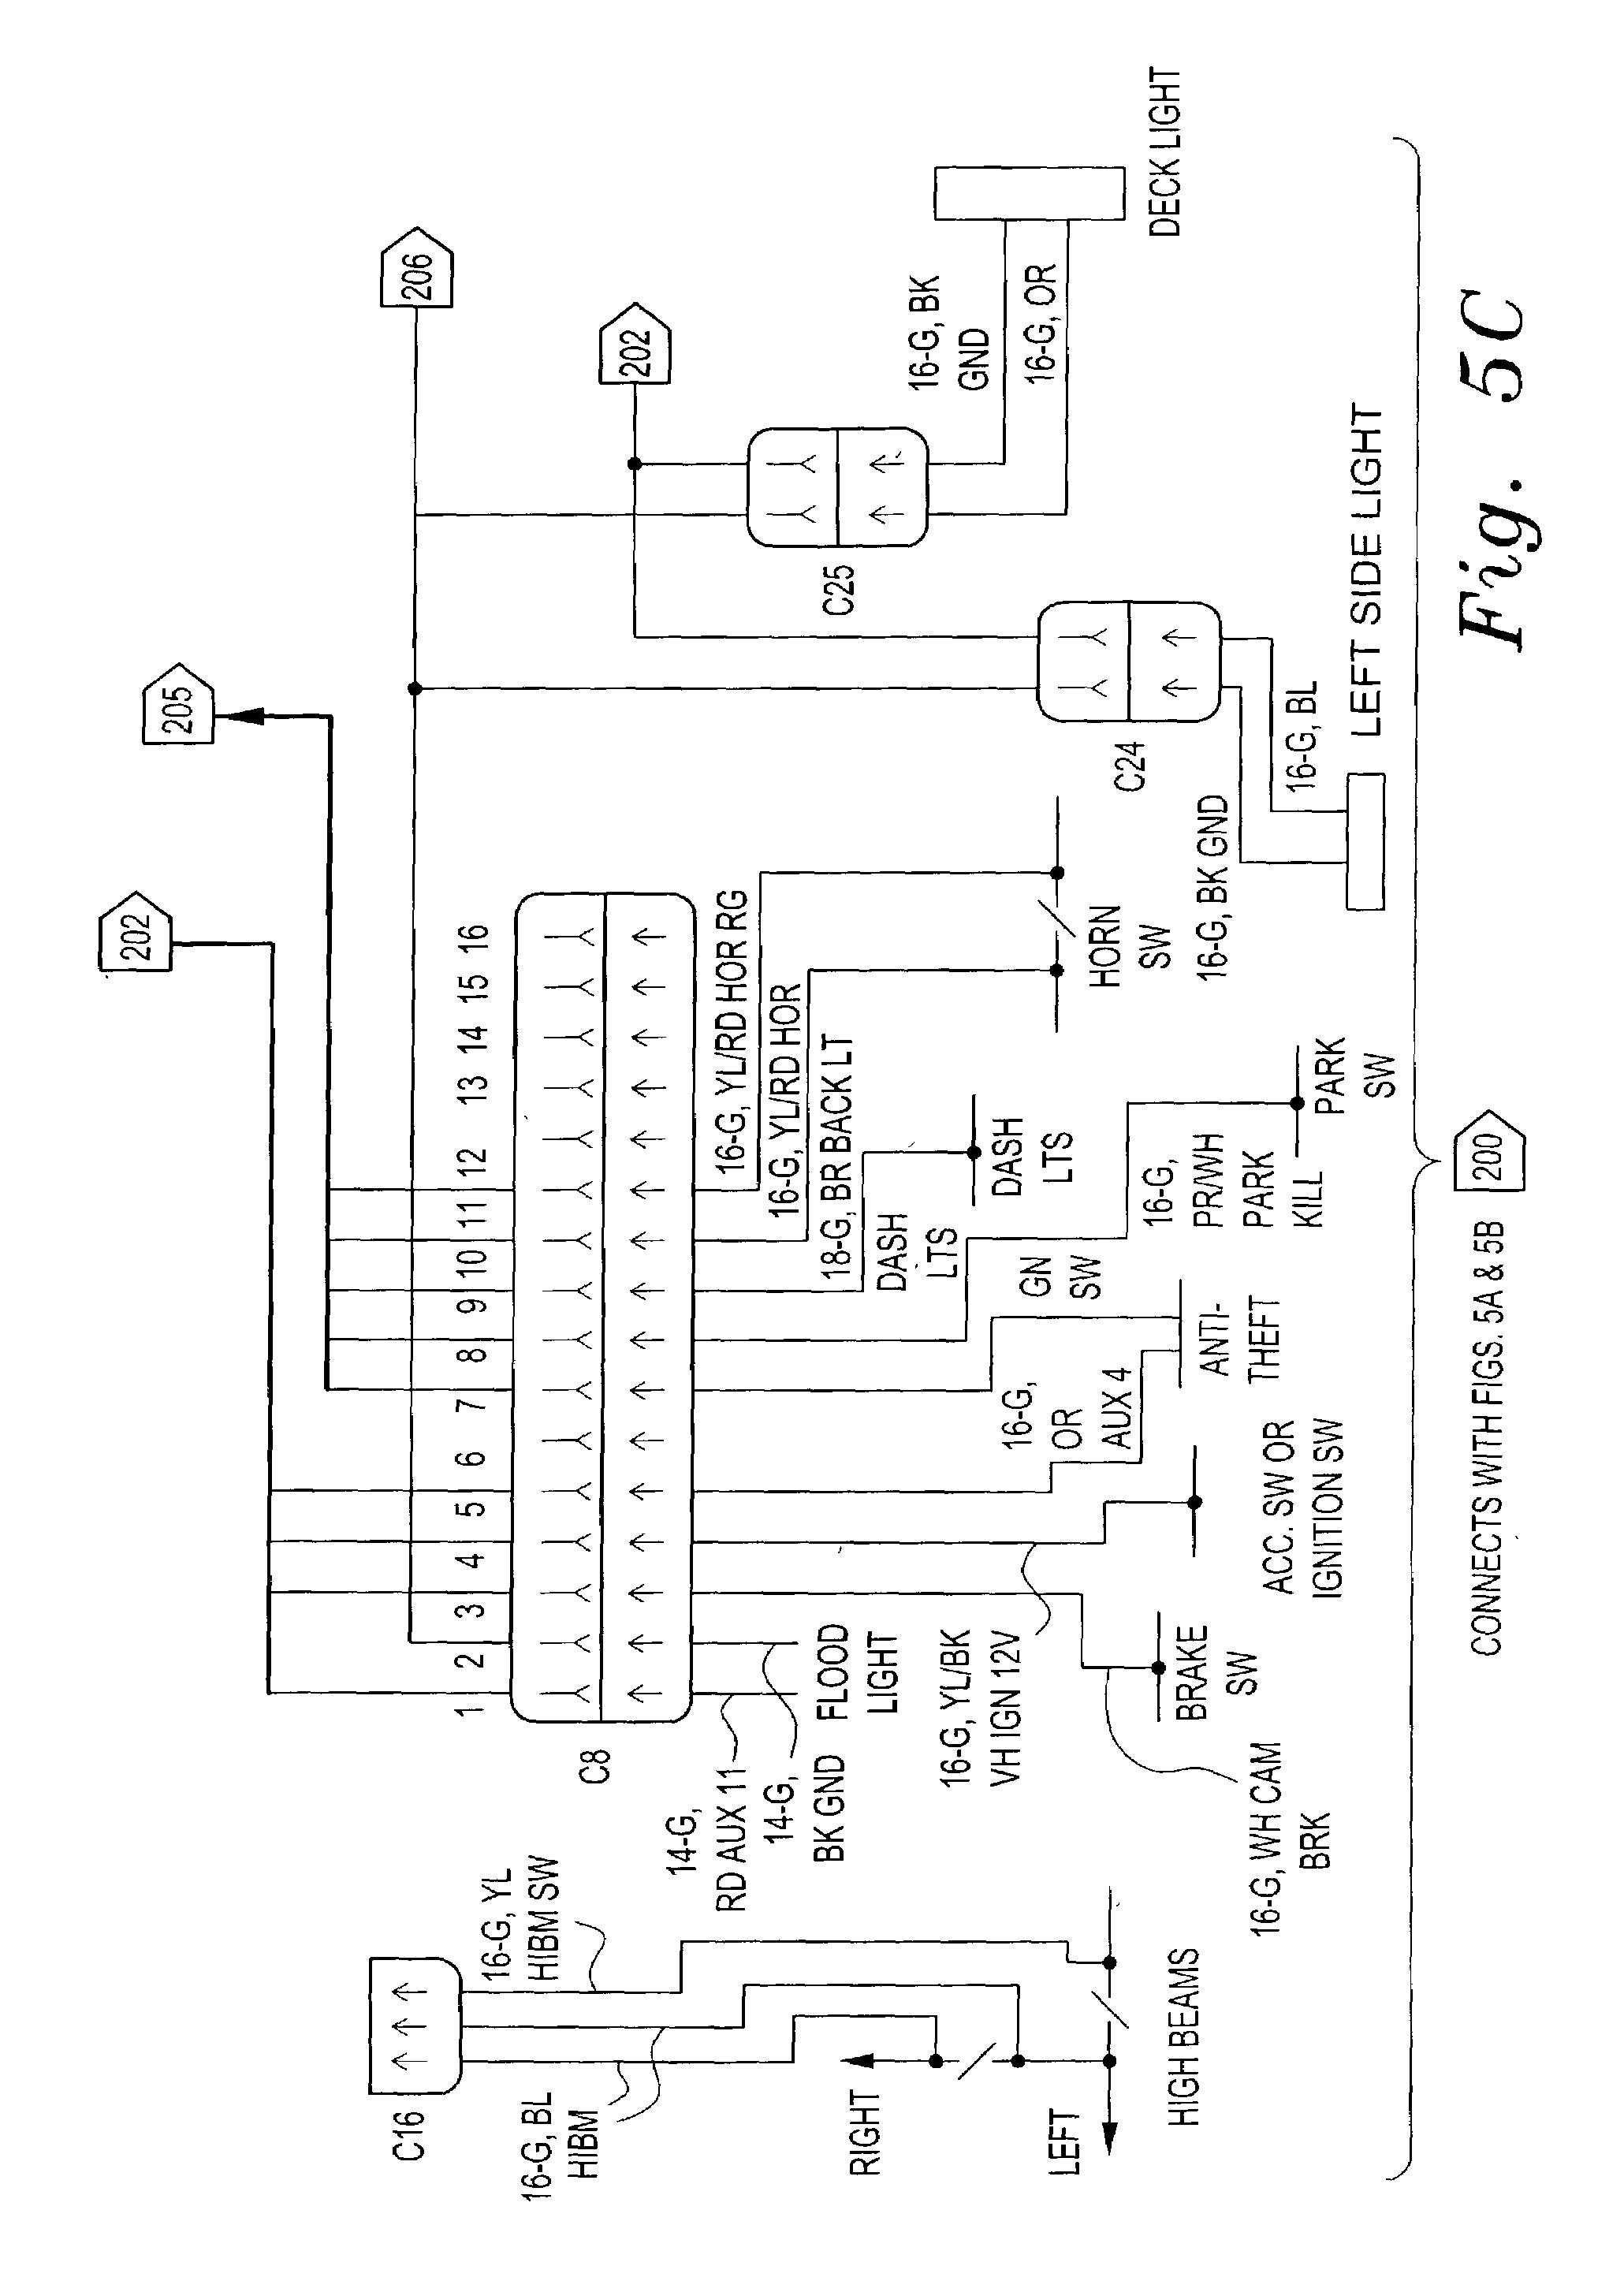 whelen siren box wiring diagram wiring diagram for whelen siren new ausgezeichnet whelen sirene 295hfsa1 drahtdiagramm ideen 6k whelen 295hf100 wiring harness wiring library